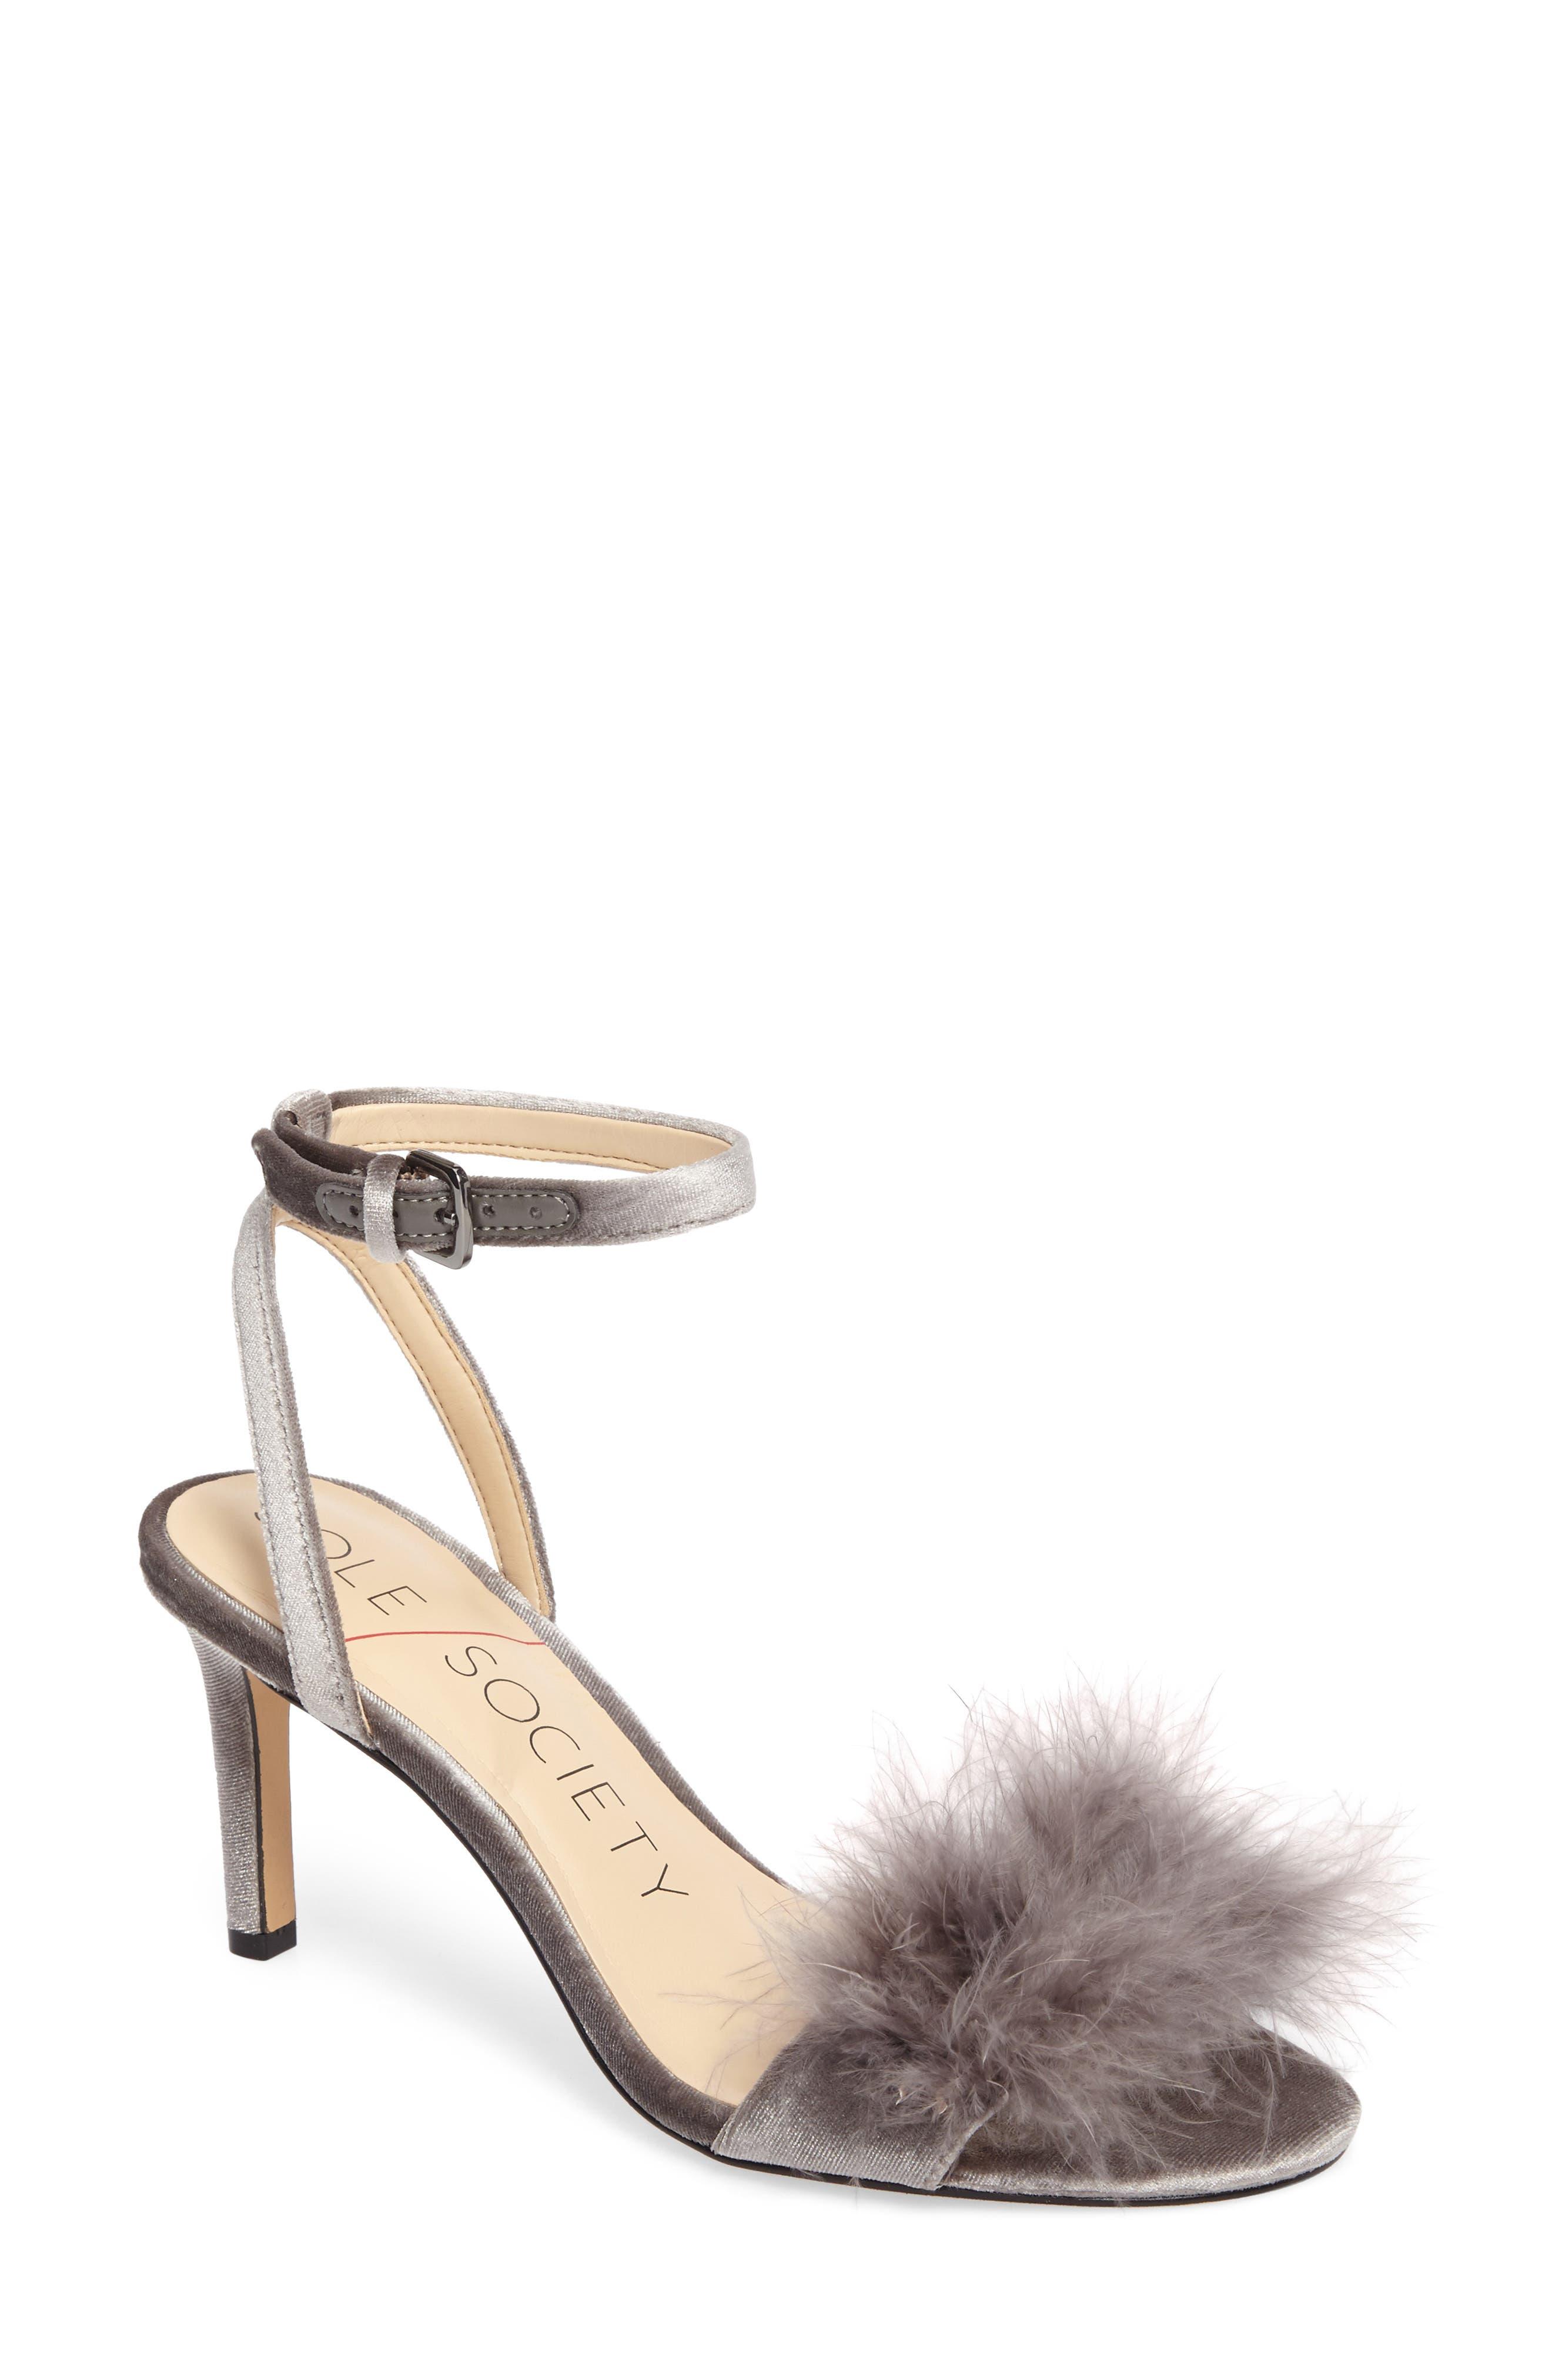 Lindzay Feather Sandal,                             Main thumbnail 1, color,                             Dark Grey